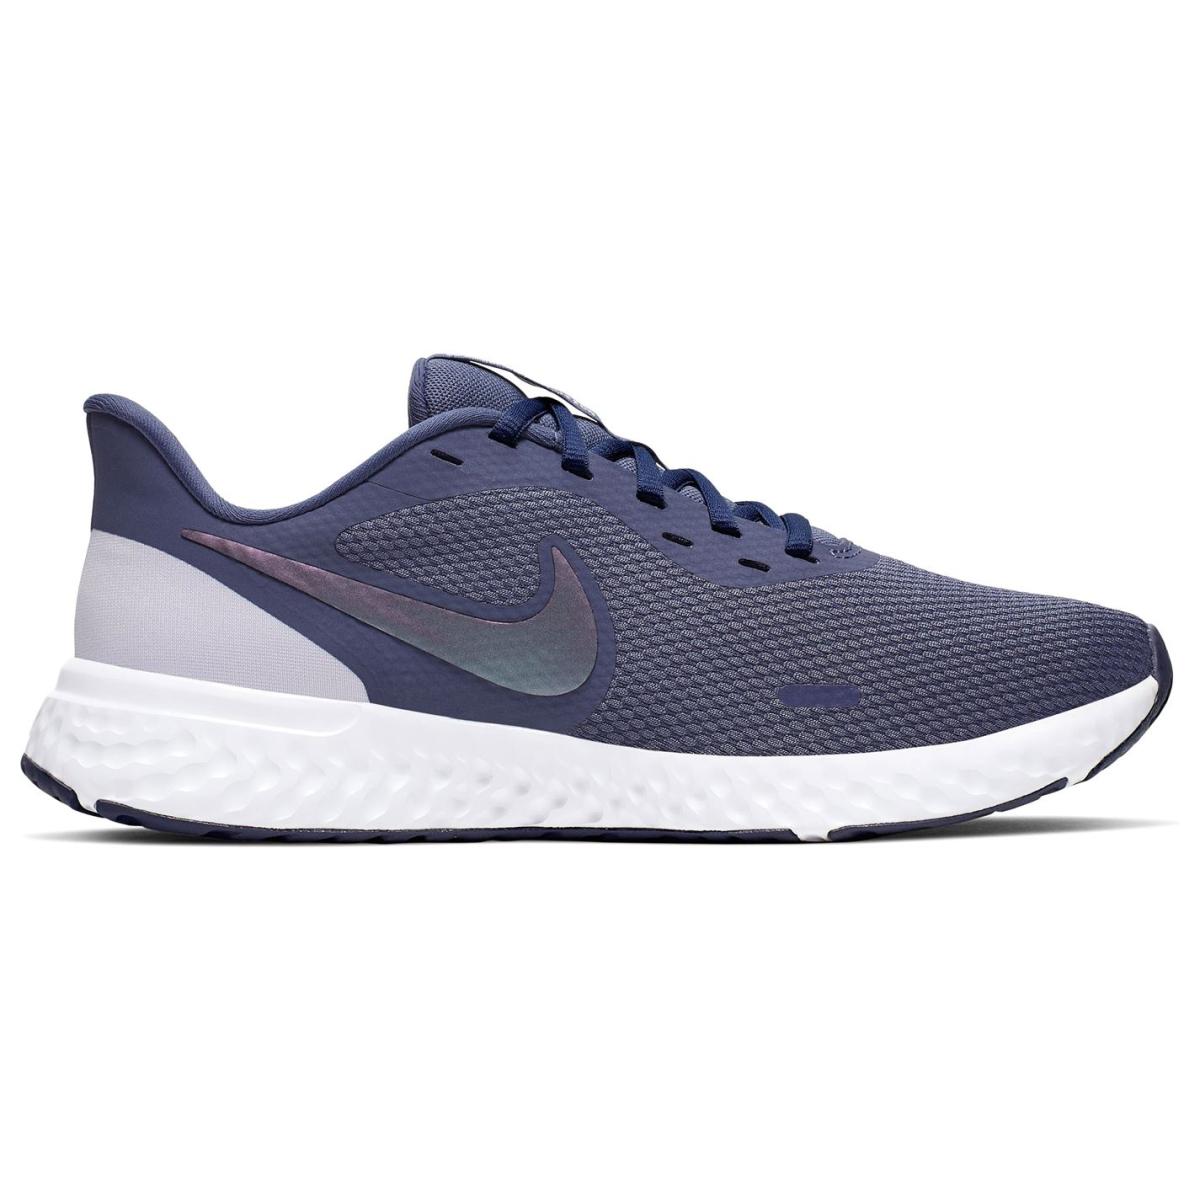 Nike-Revolution-Turnschuhe-Damen-Sneaker-Sportschuhe-Laufschuhe-1160 Indexbild 43